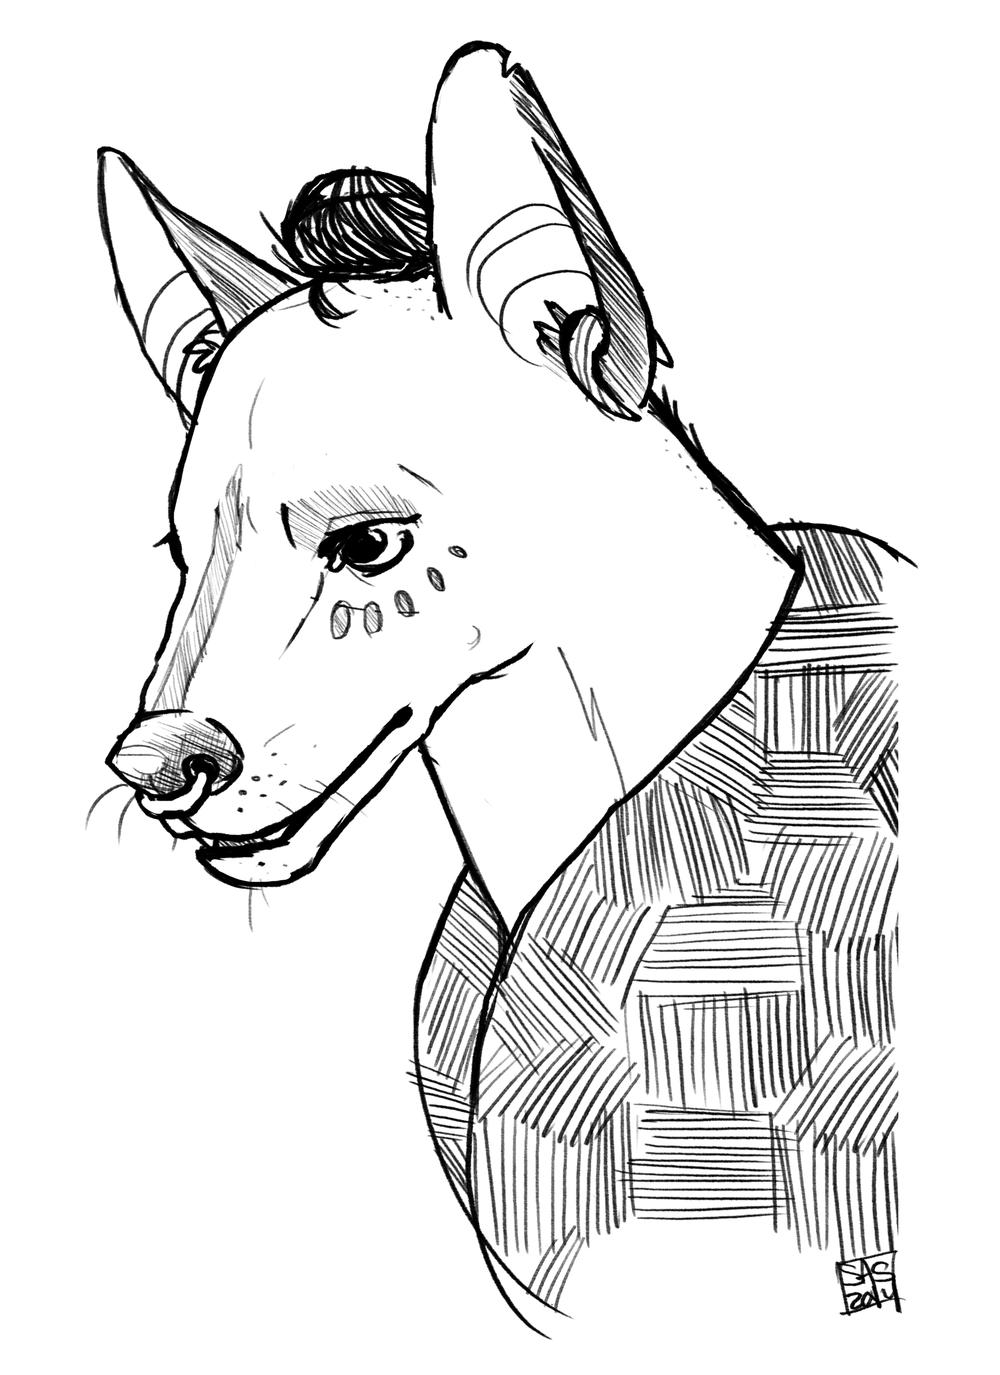 manedwolfdoodle.png